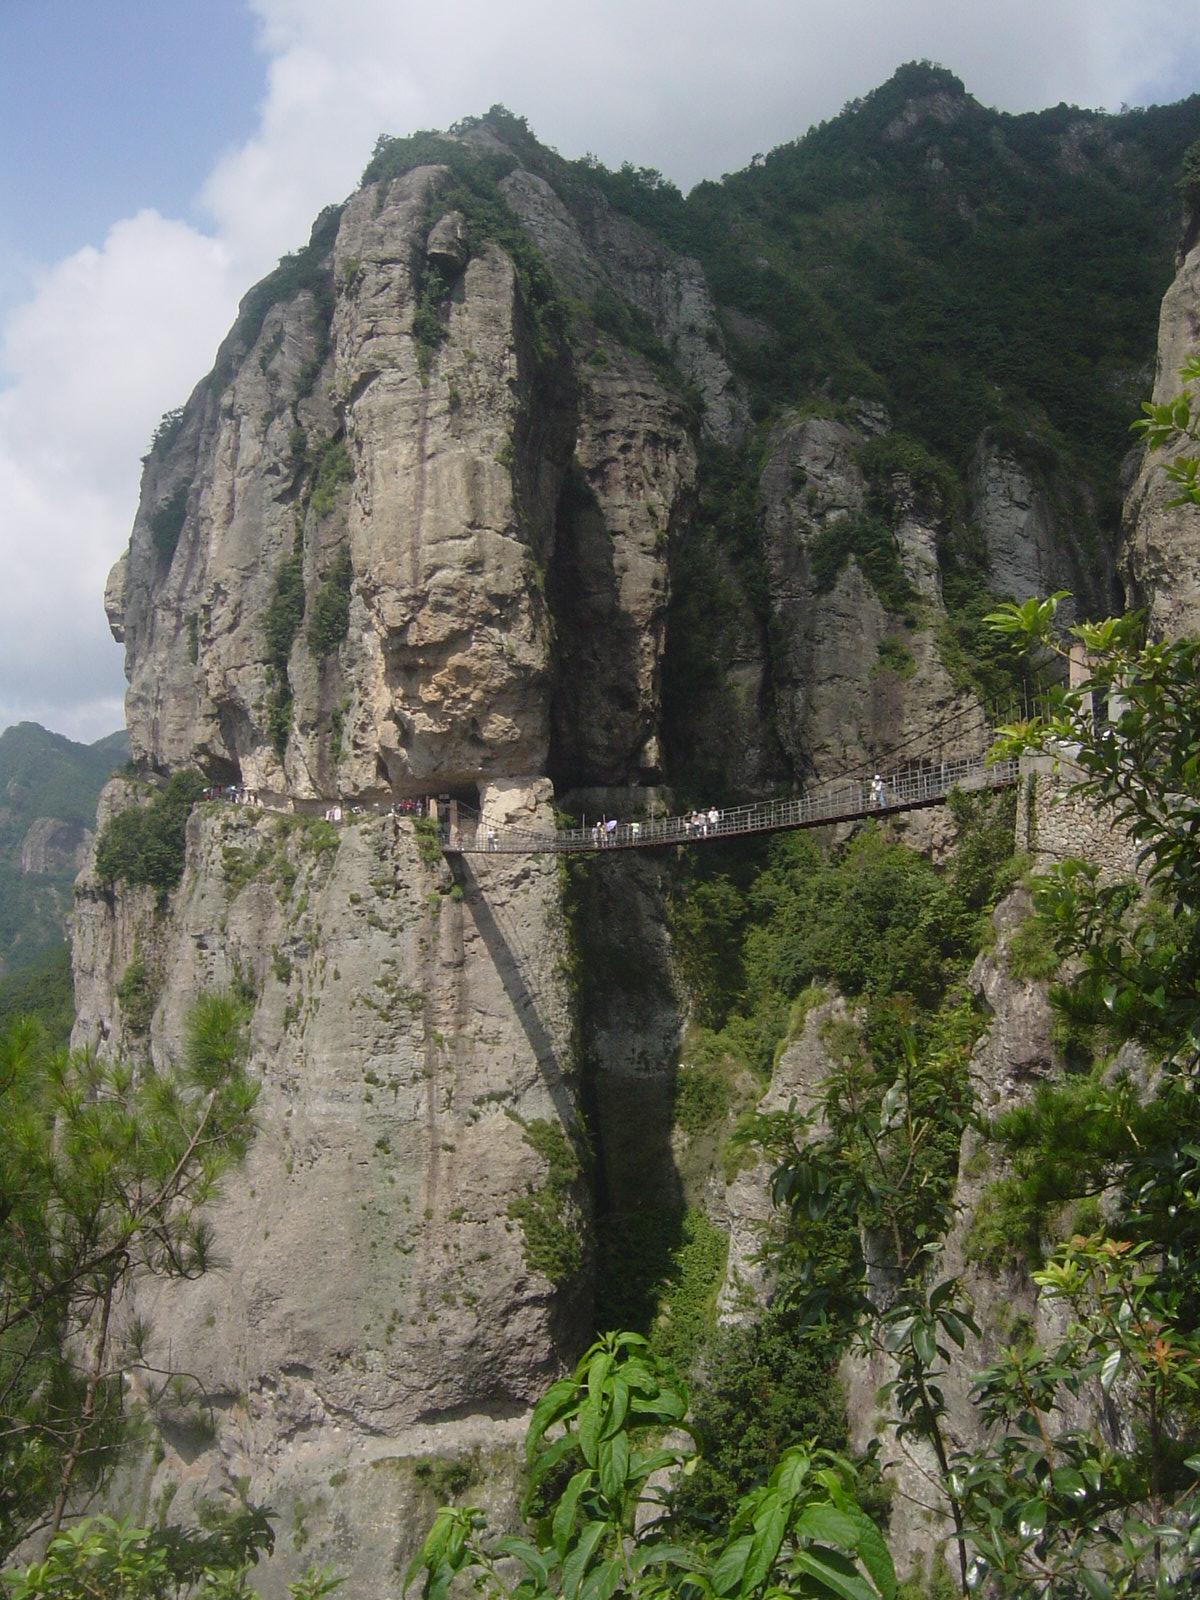 Hua Shan and Huangshan: China's Mystical Mountain Scenery ...